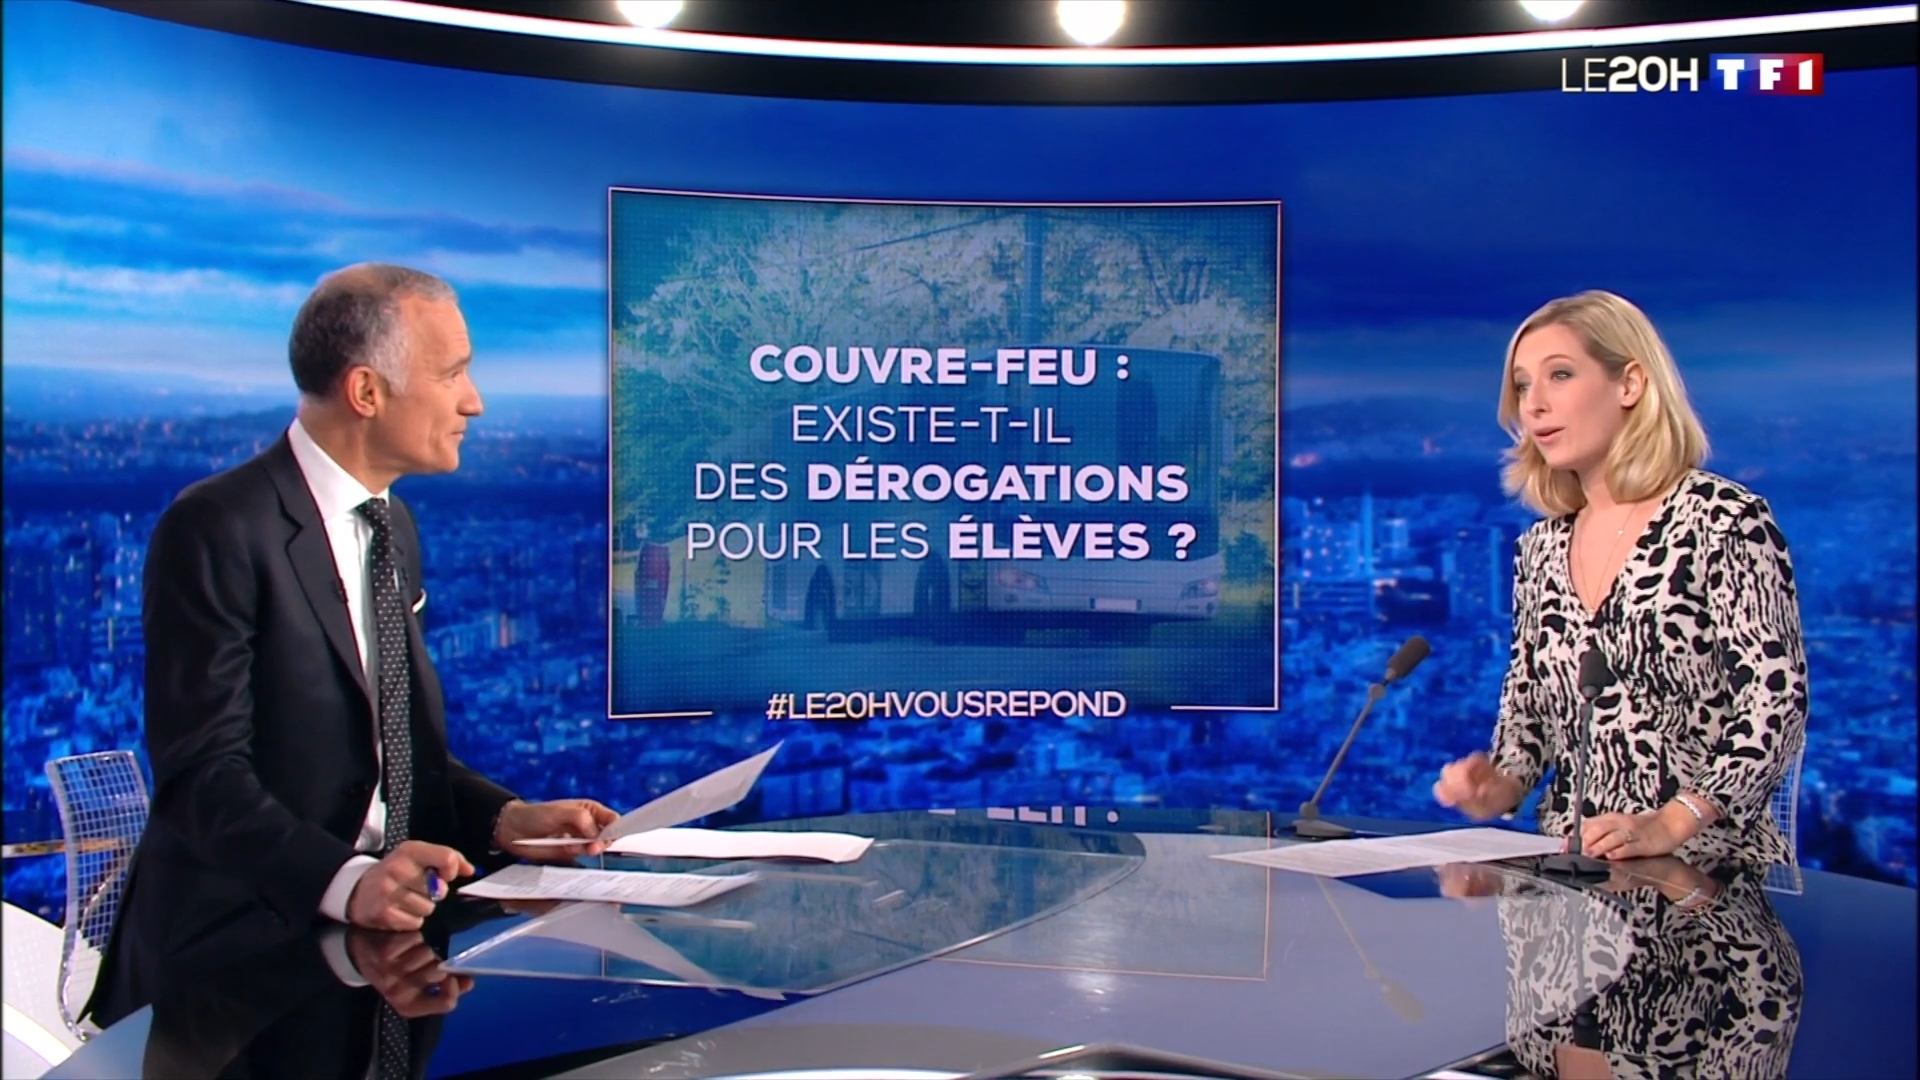 2021-01-19_20_00_TF1_Le-20h.mp4_snapshot_00.45.22.718.jpg